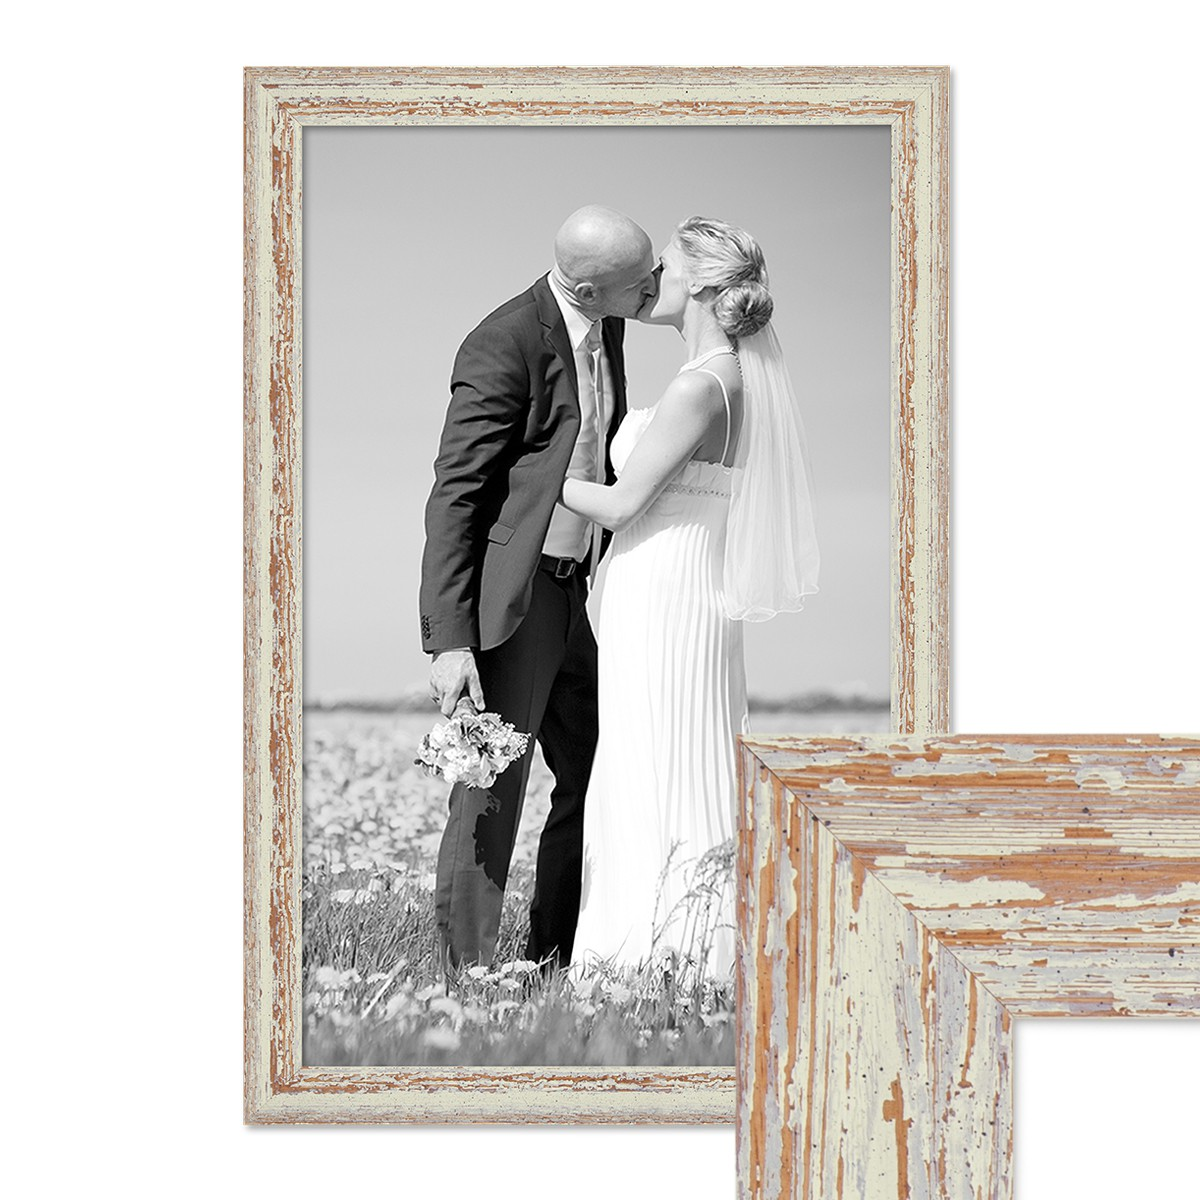 Vintage Bilderrahmen 40x60 cm Weiss Shabby-Chic Massivholz mit ...